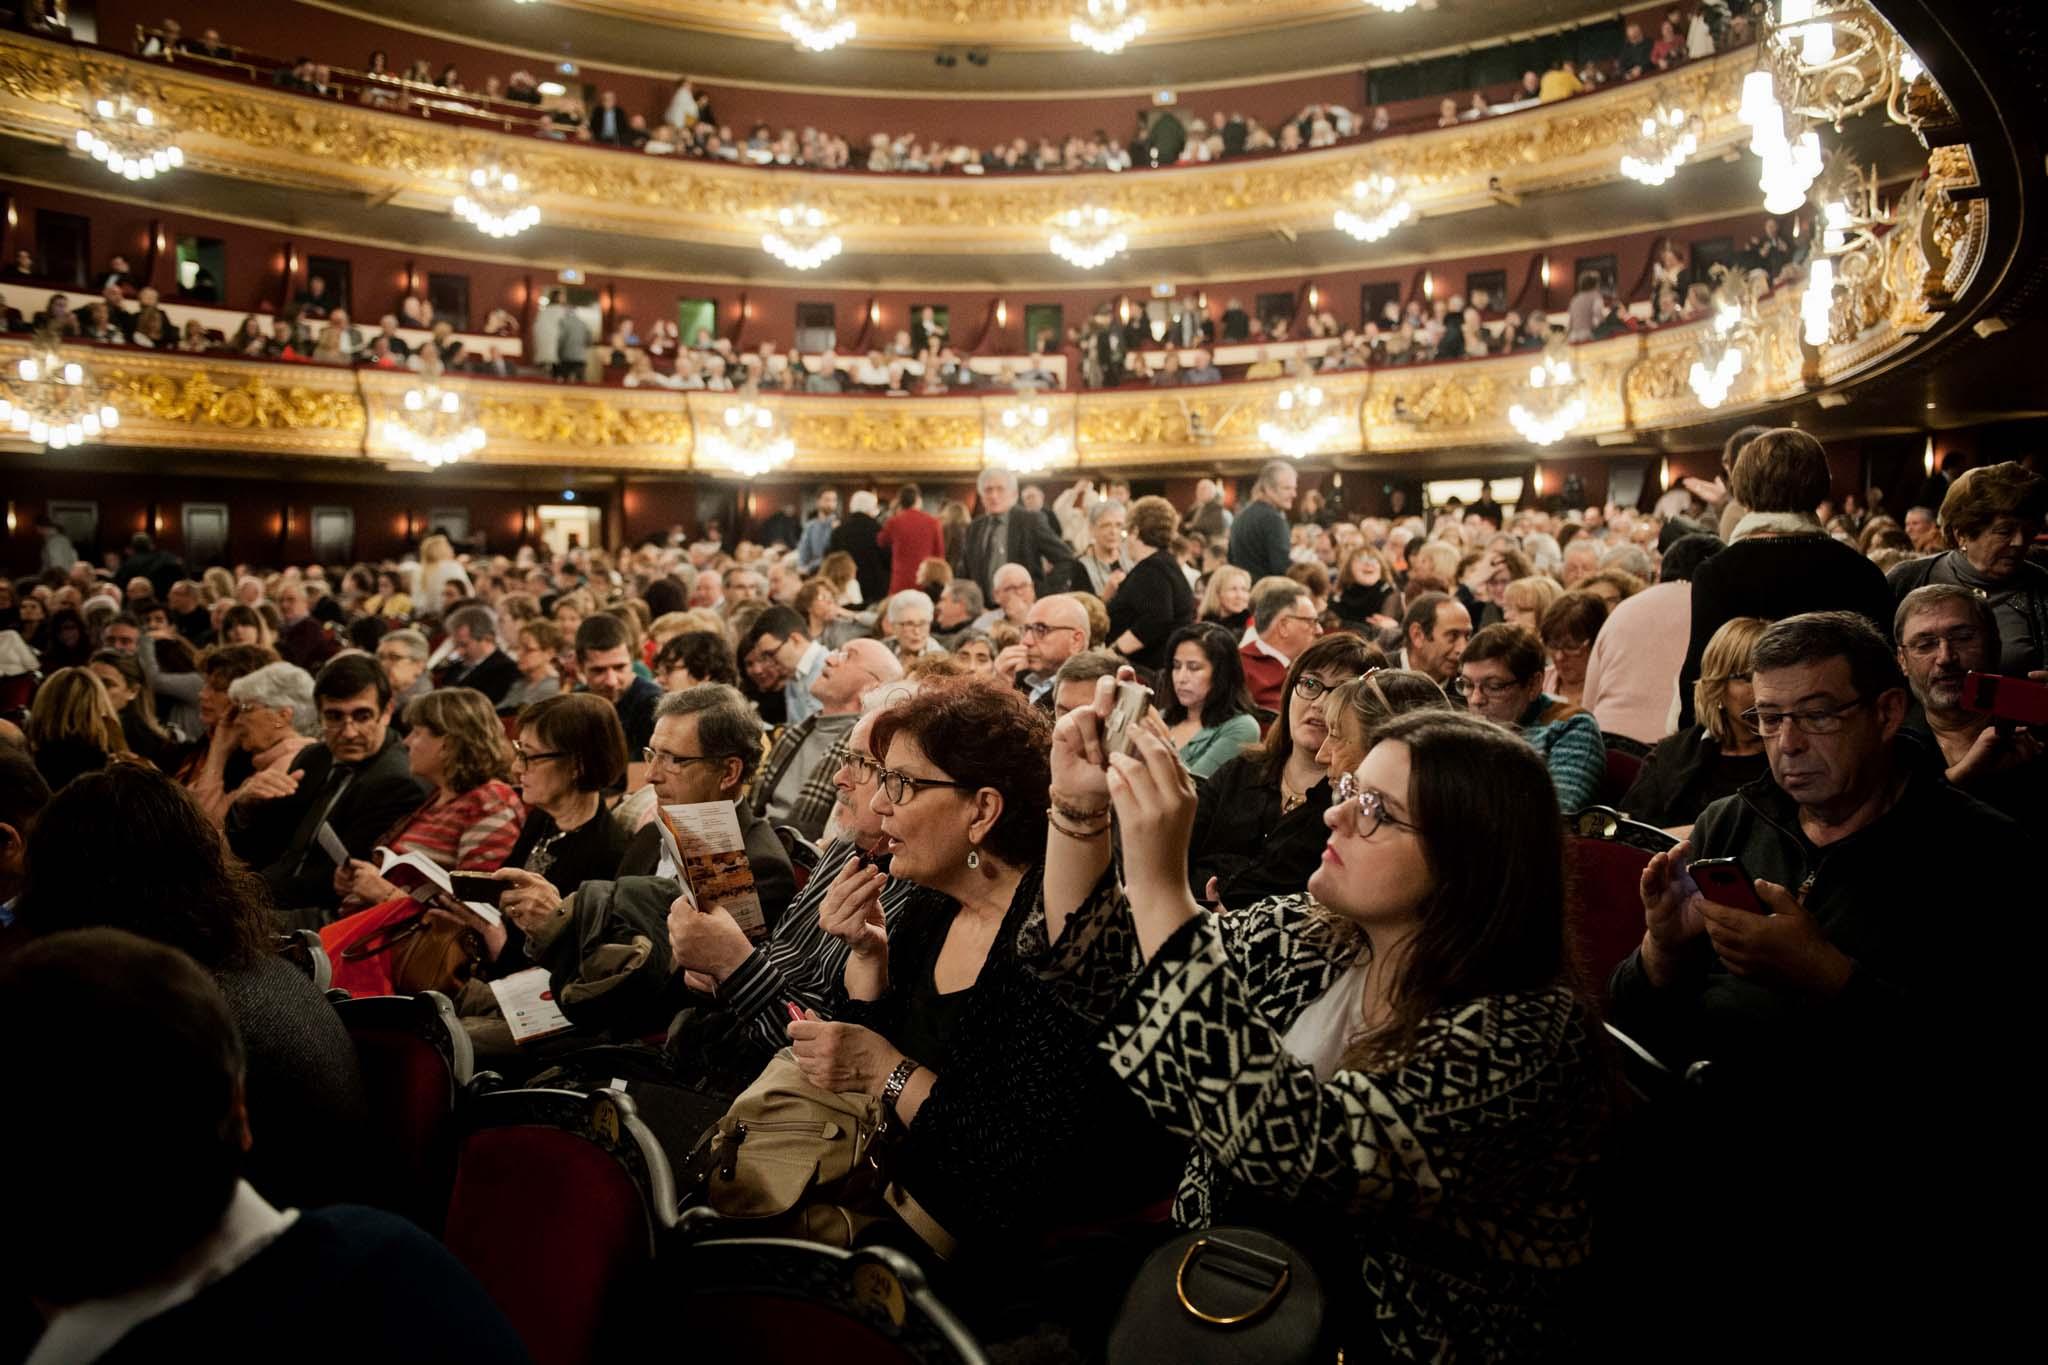 La Mútua en el gran concierto de Simfonova en el Gran Teatre del Liceu